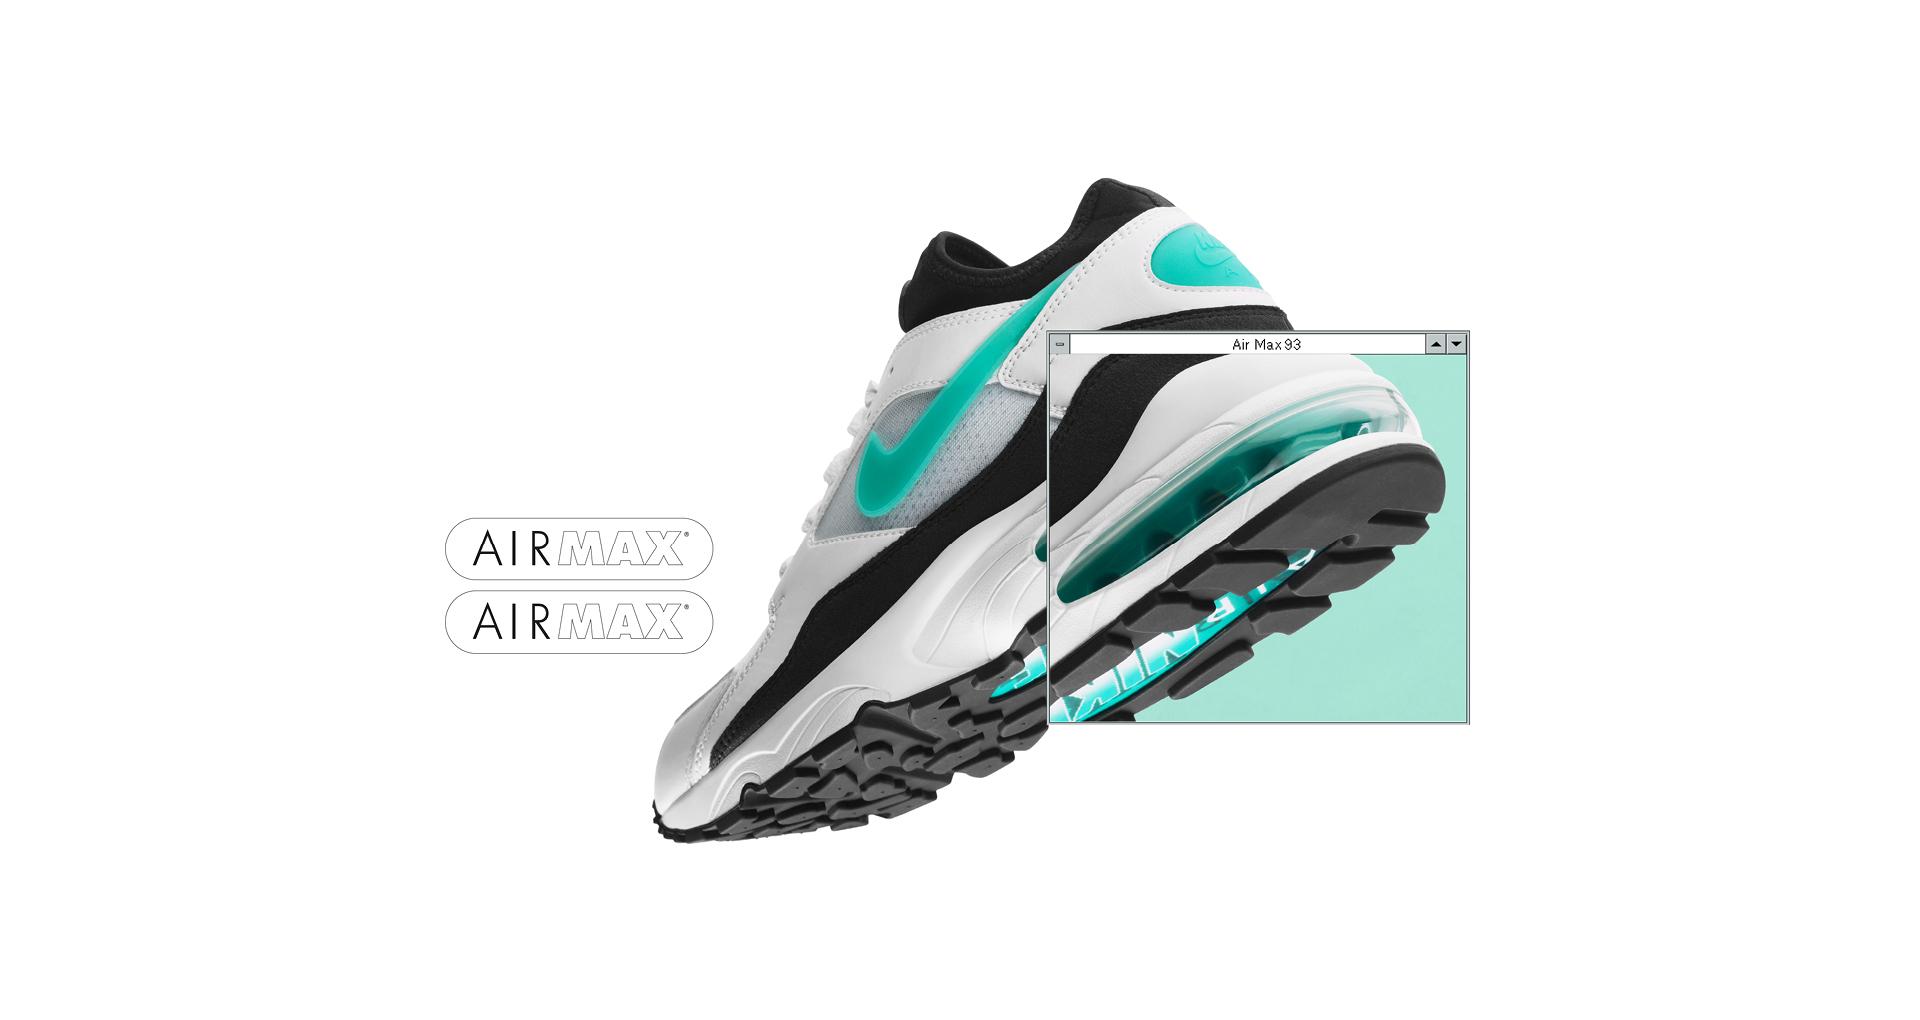 Nike Hilo Styleforum Pagina 780 Styleforum Hilo b35740